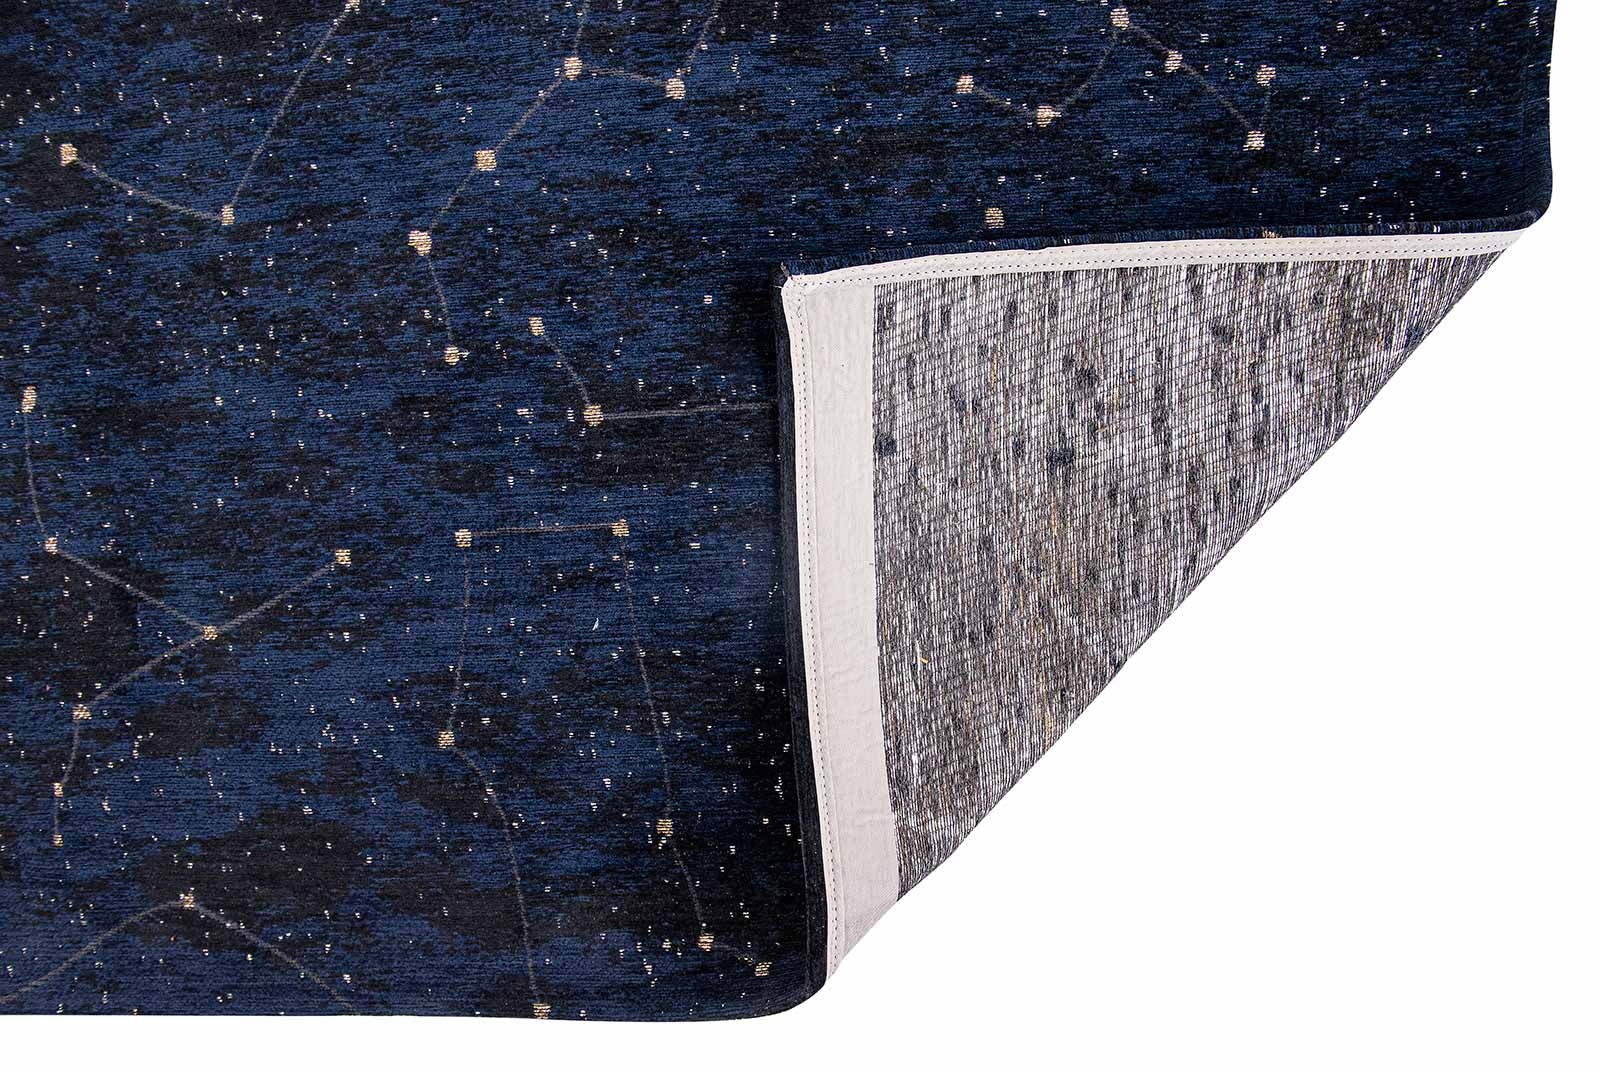 Louis De Poortere rug Fischbacher 9060 Celestial Midnight Blue back